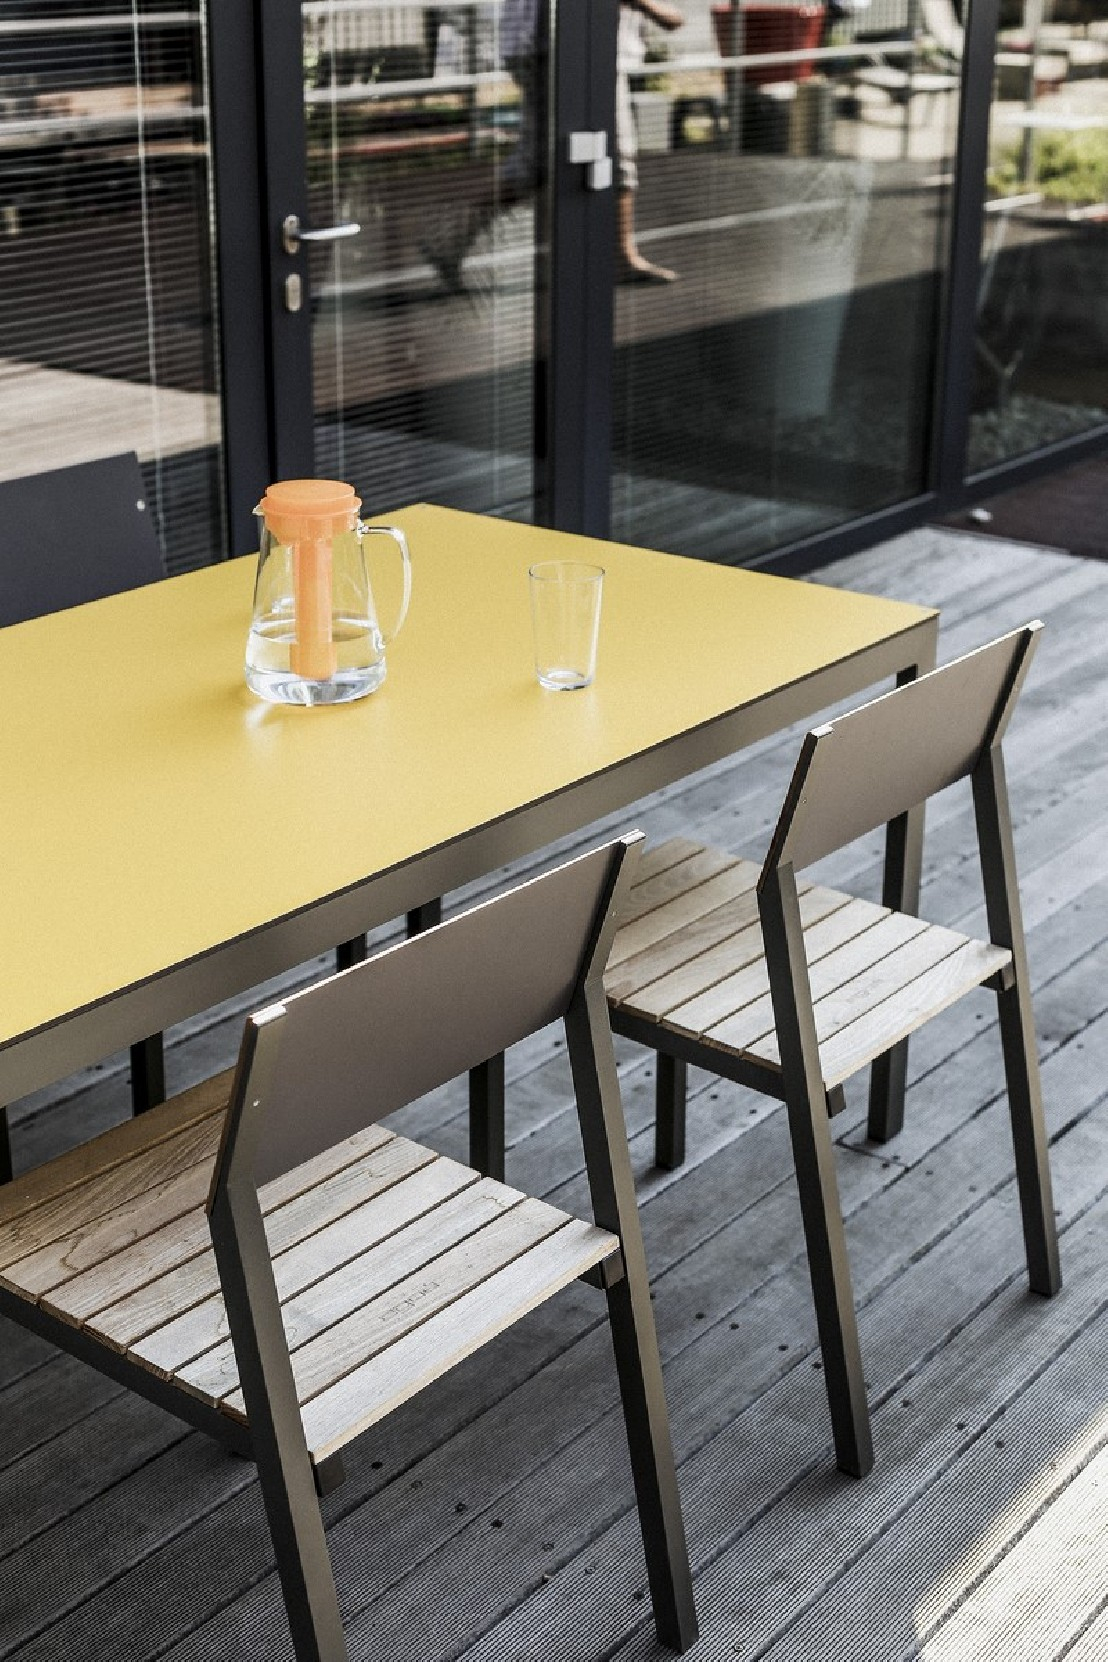 Salon De Jardin Cora, Table Rectangle 175 Cm Et 4 Chaises ... destiné Salon De Jardin Cora